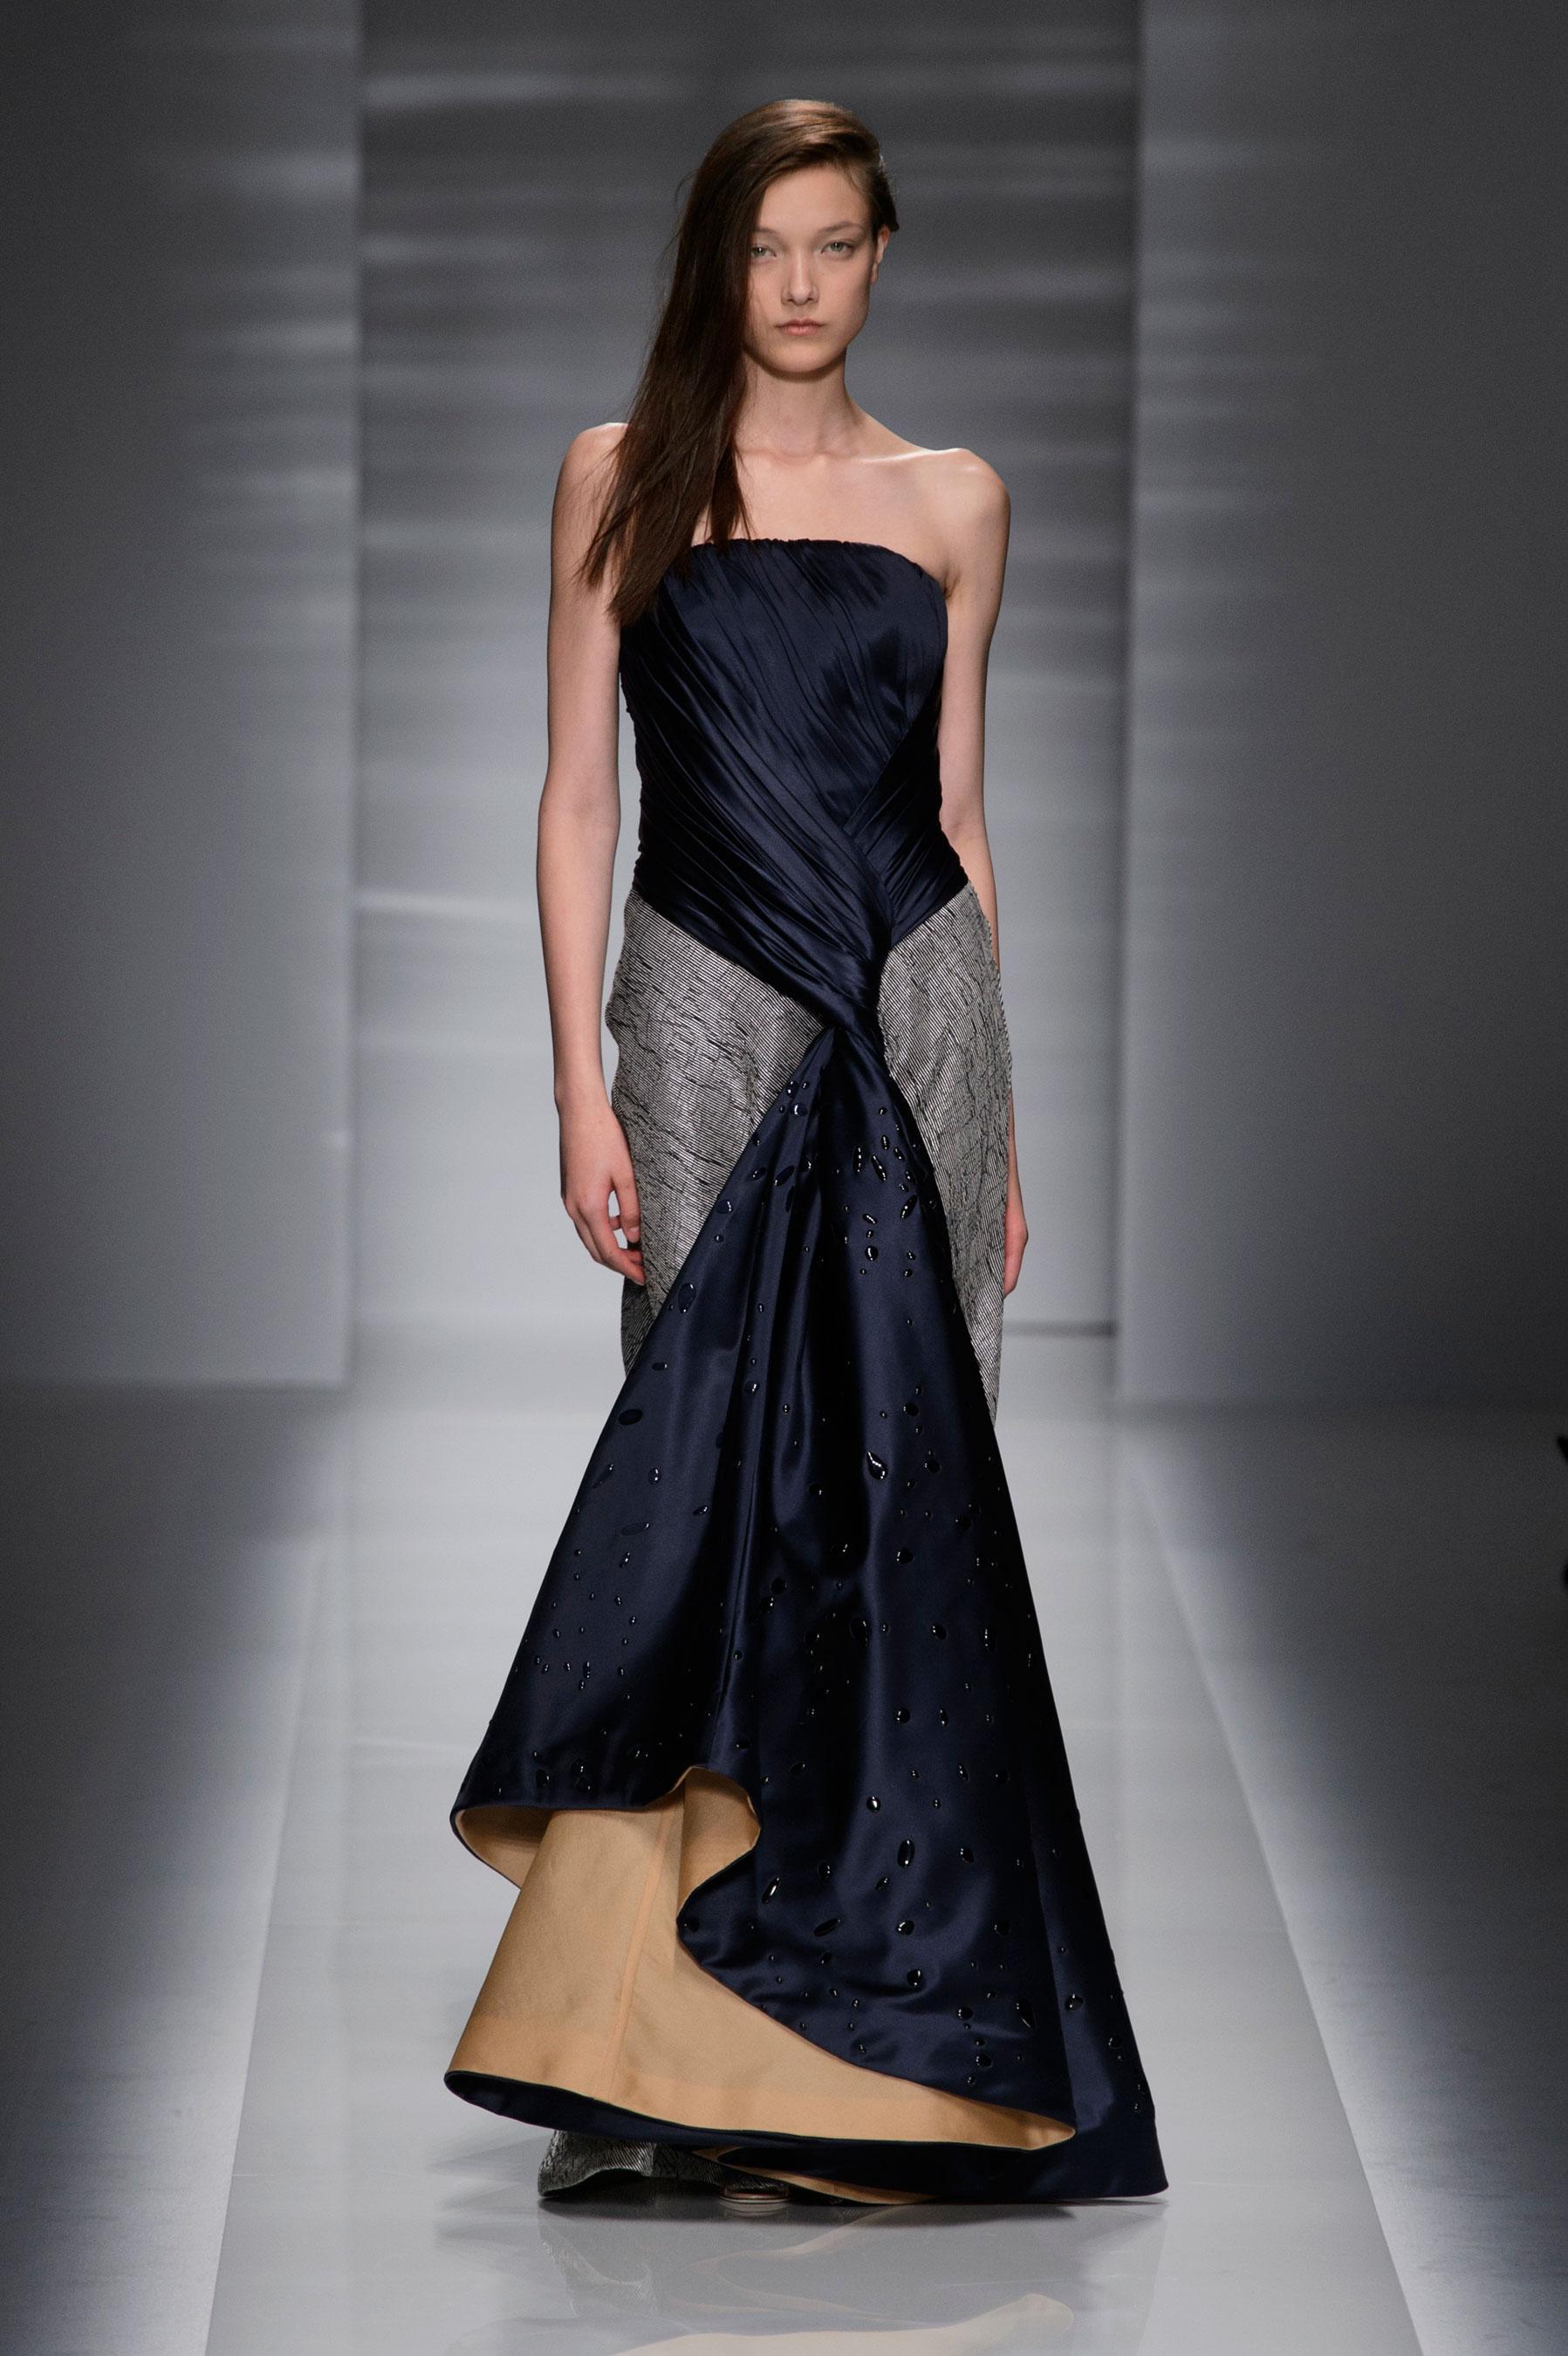 D fil vionnet automne hiver 2014 2015 couture madame figaro for 1900 haute couture